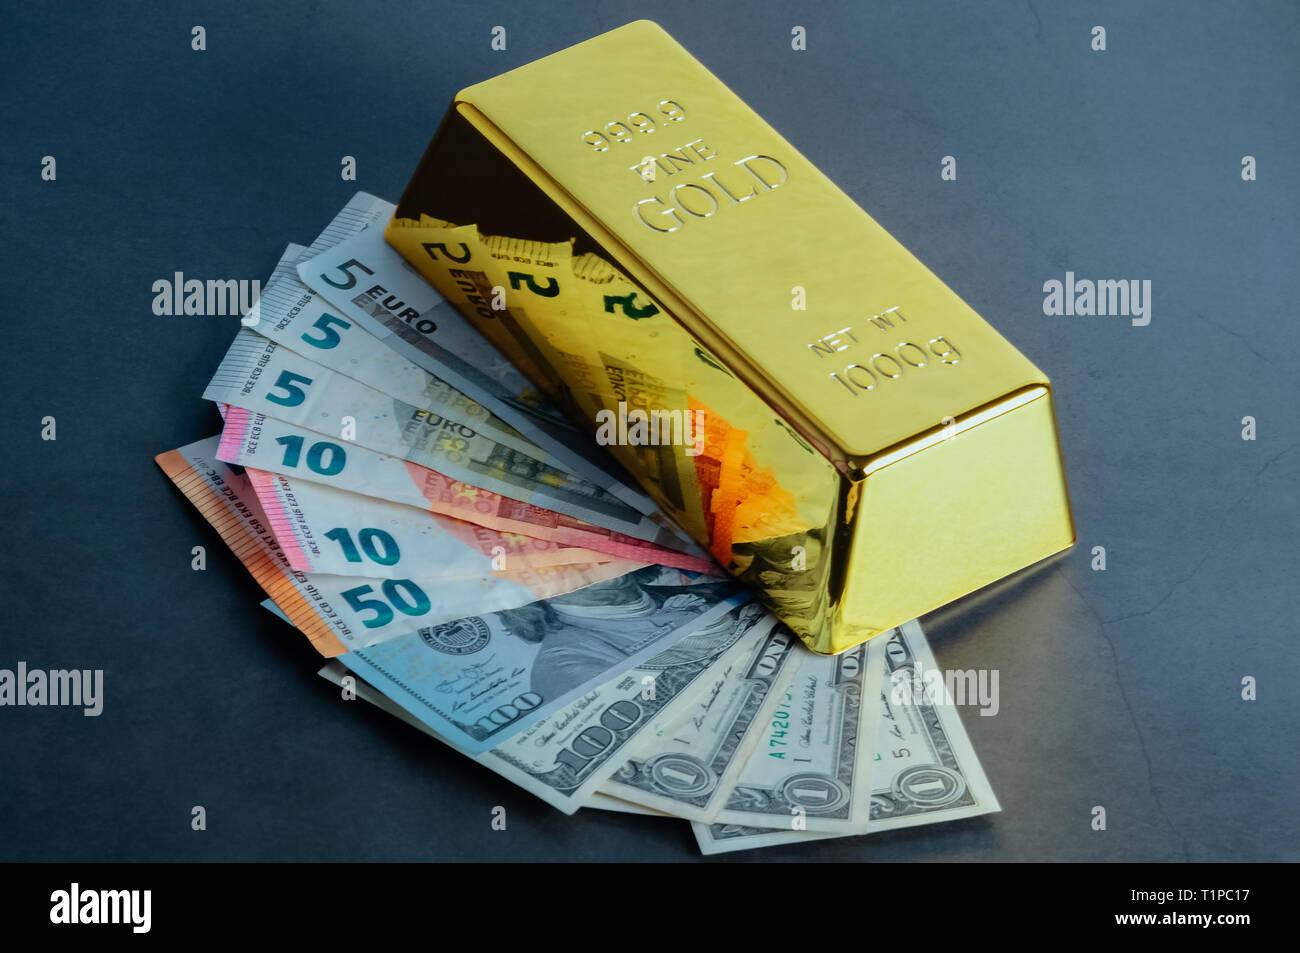 Gold bar ingot bullion against the background of dollar and euro bills - Stock Image